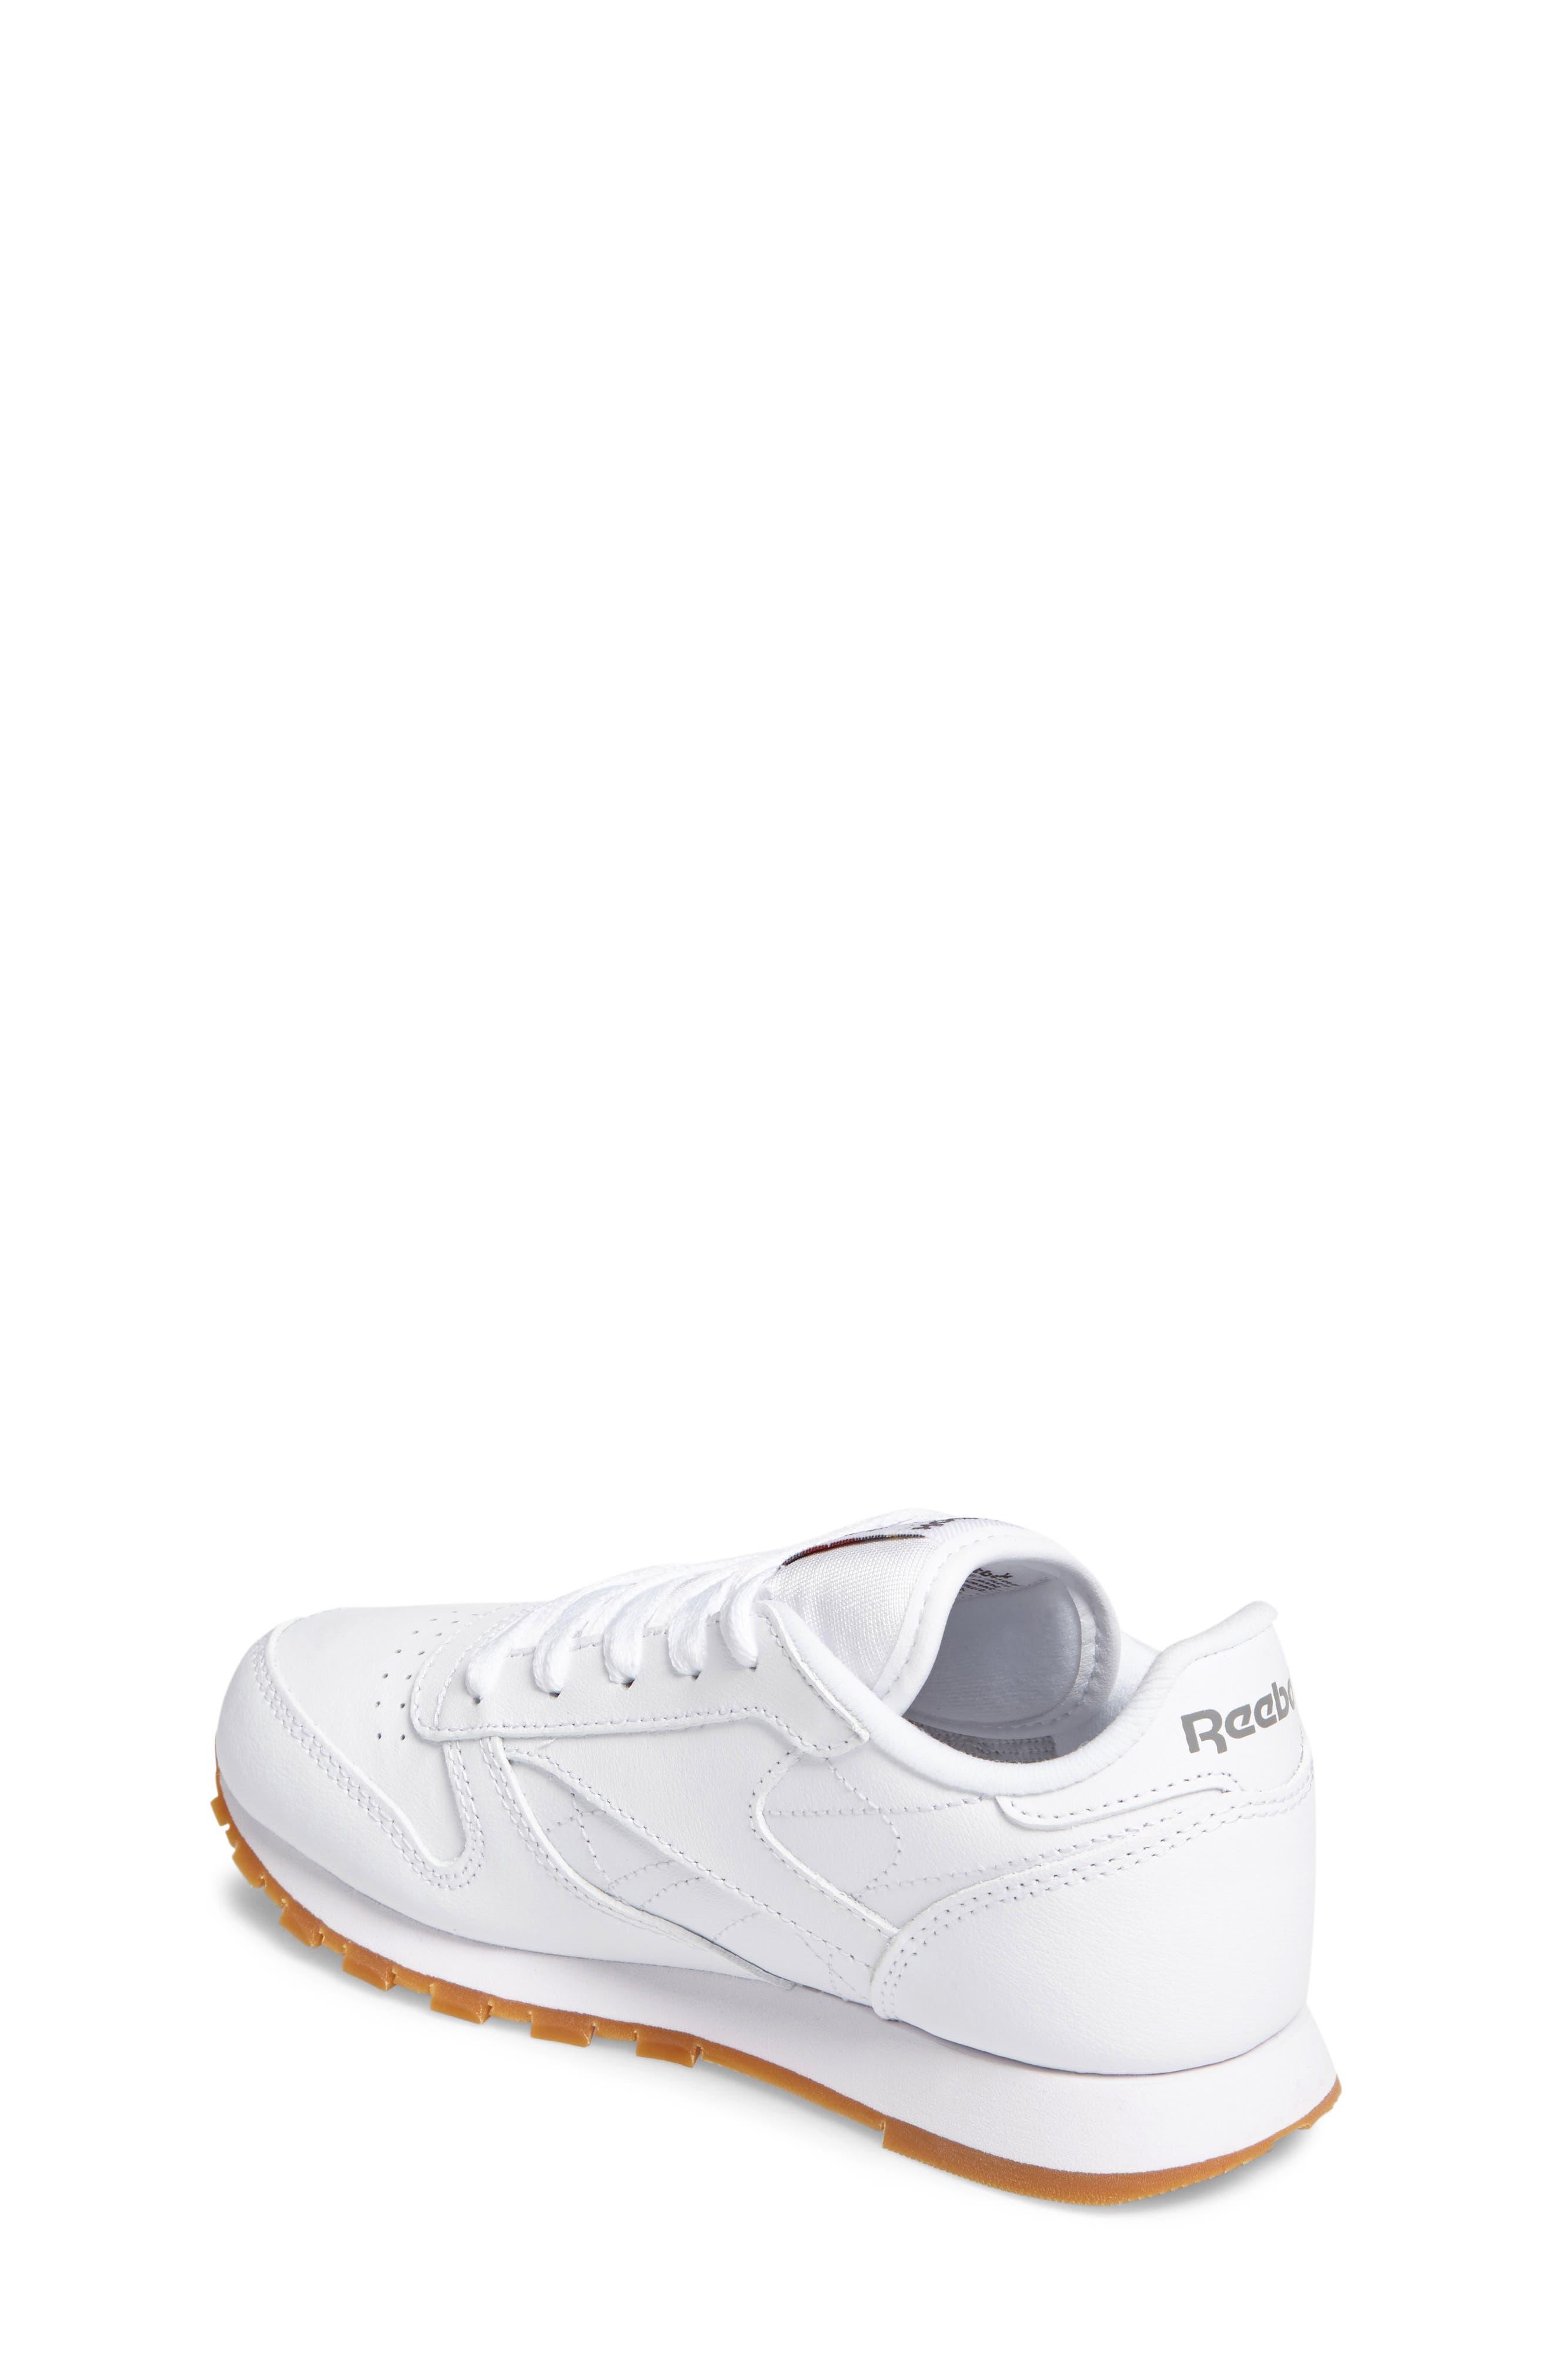 Classic Leather Sneaker,                             Alternate thumbnail 3, color,                             WHITE/ GUM